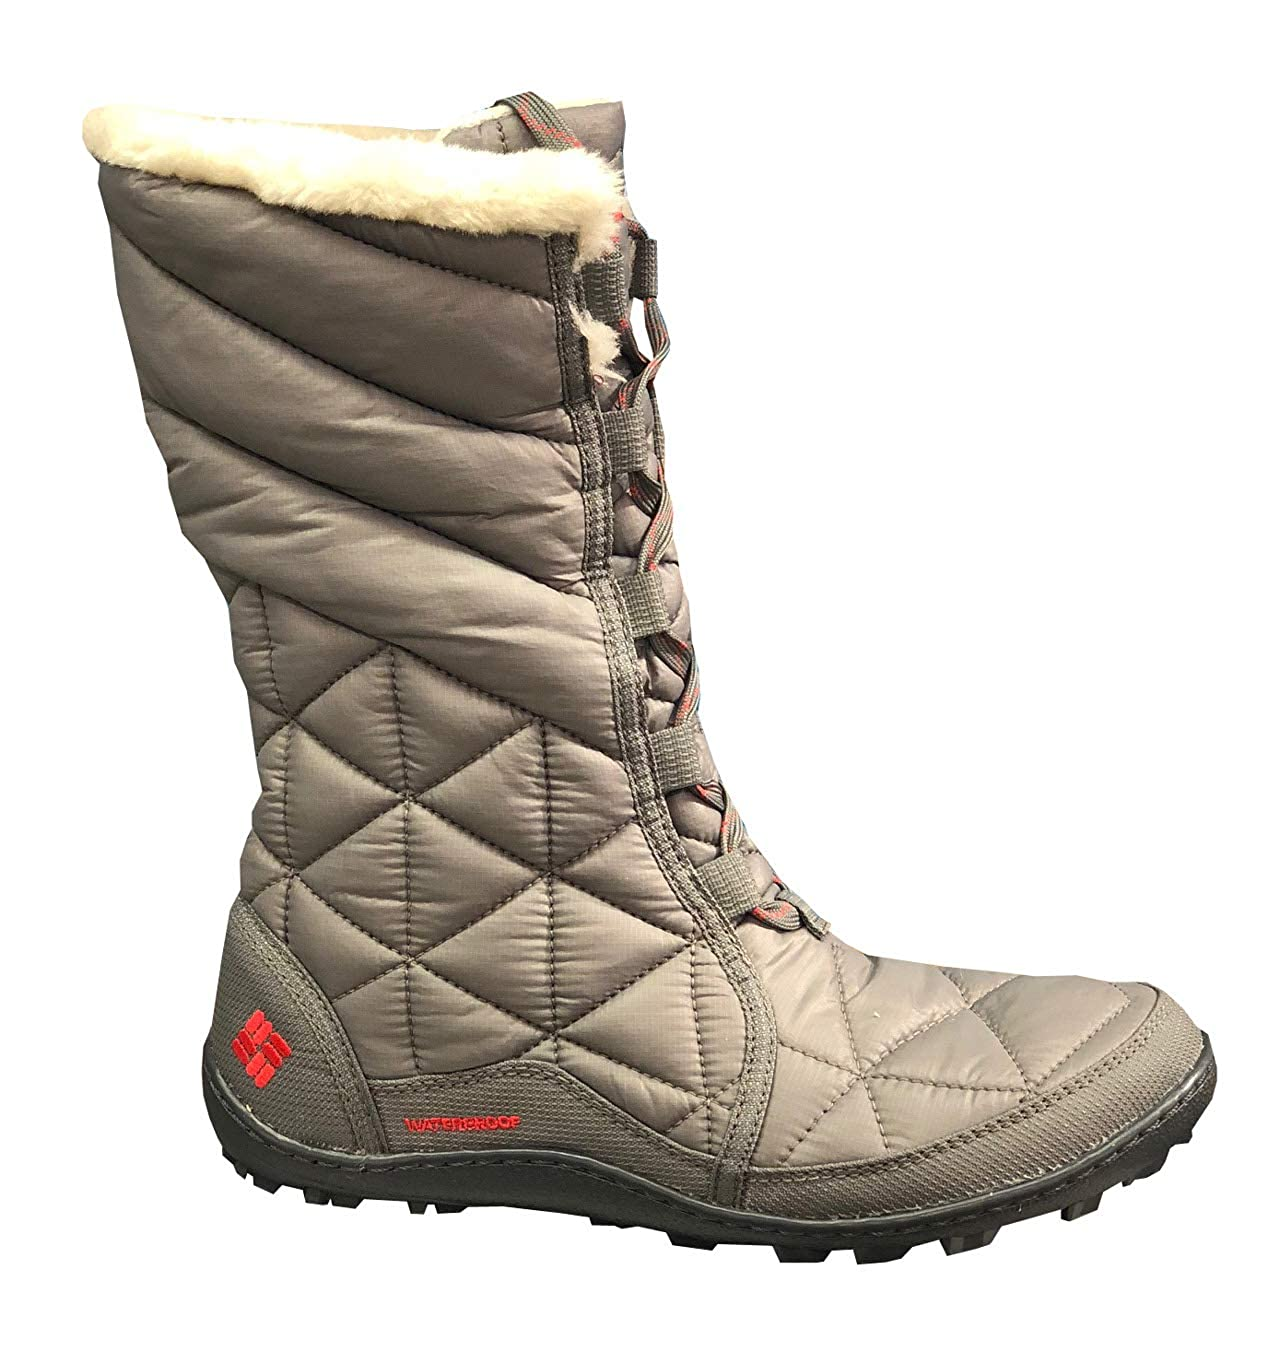 Columbia Womens Powder Summit II Mid Waterproof Snow Boots